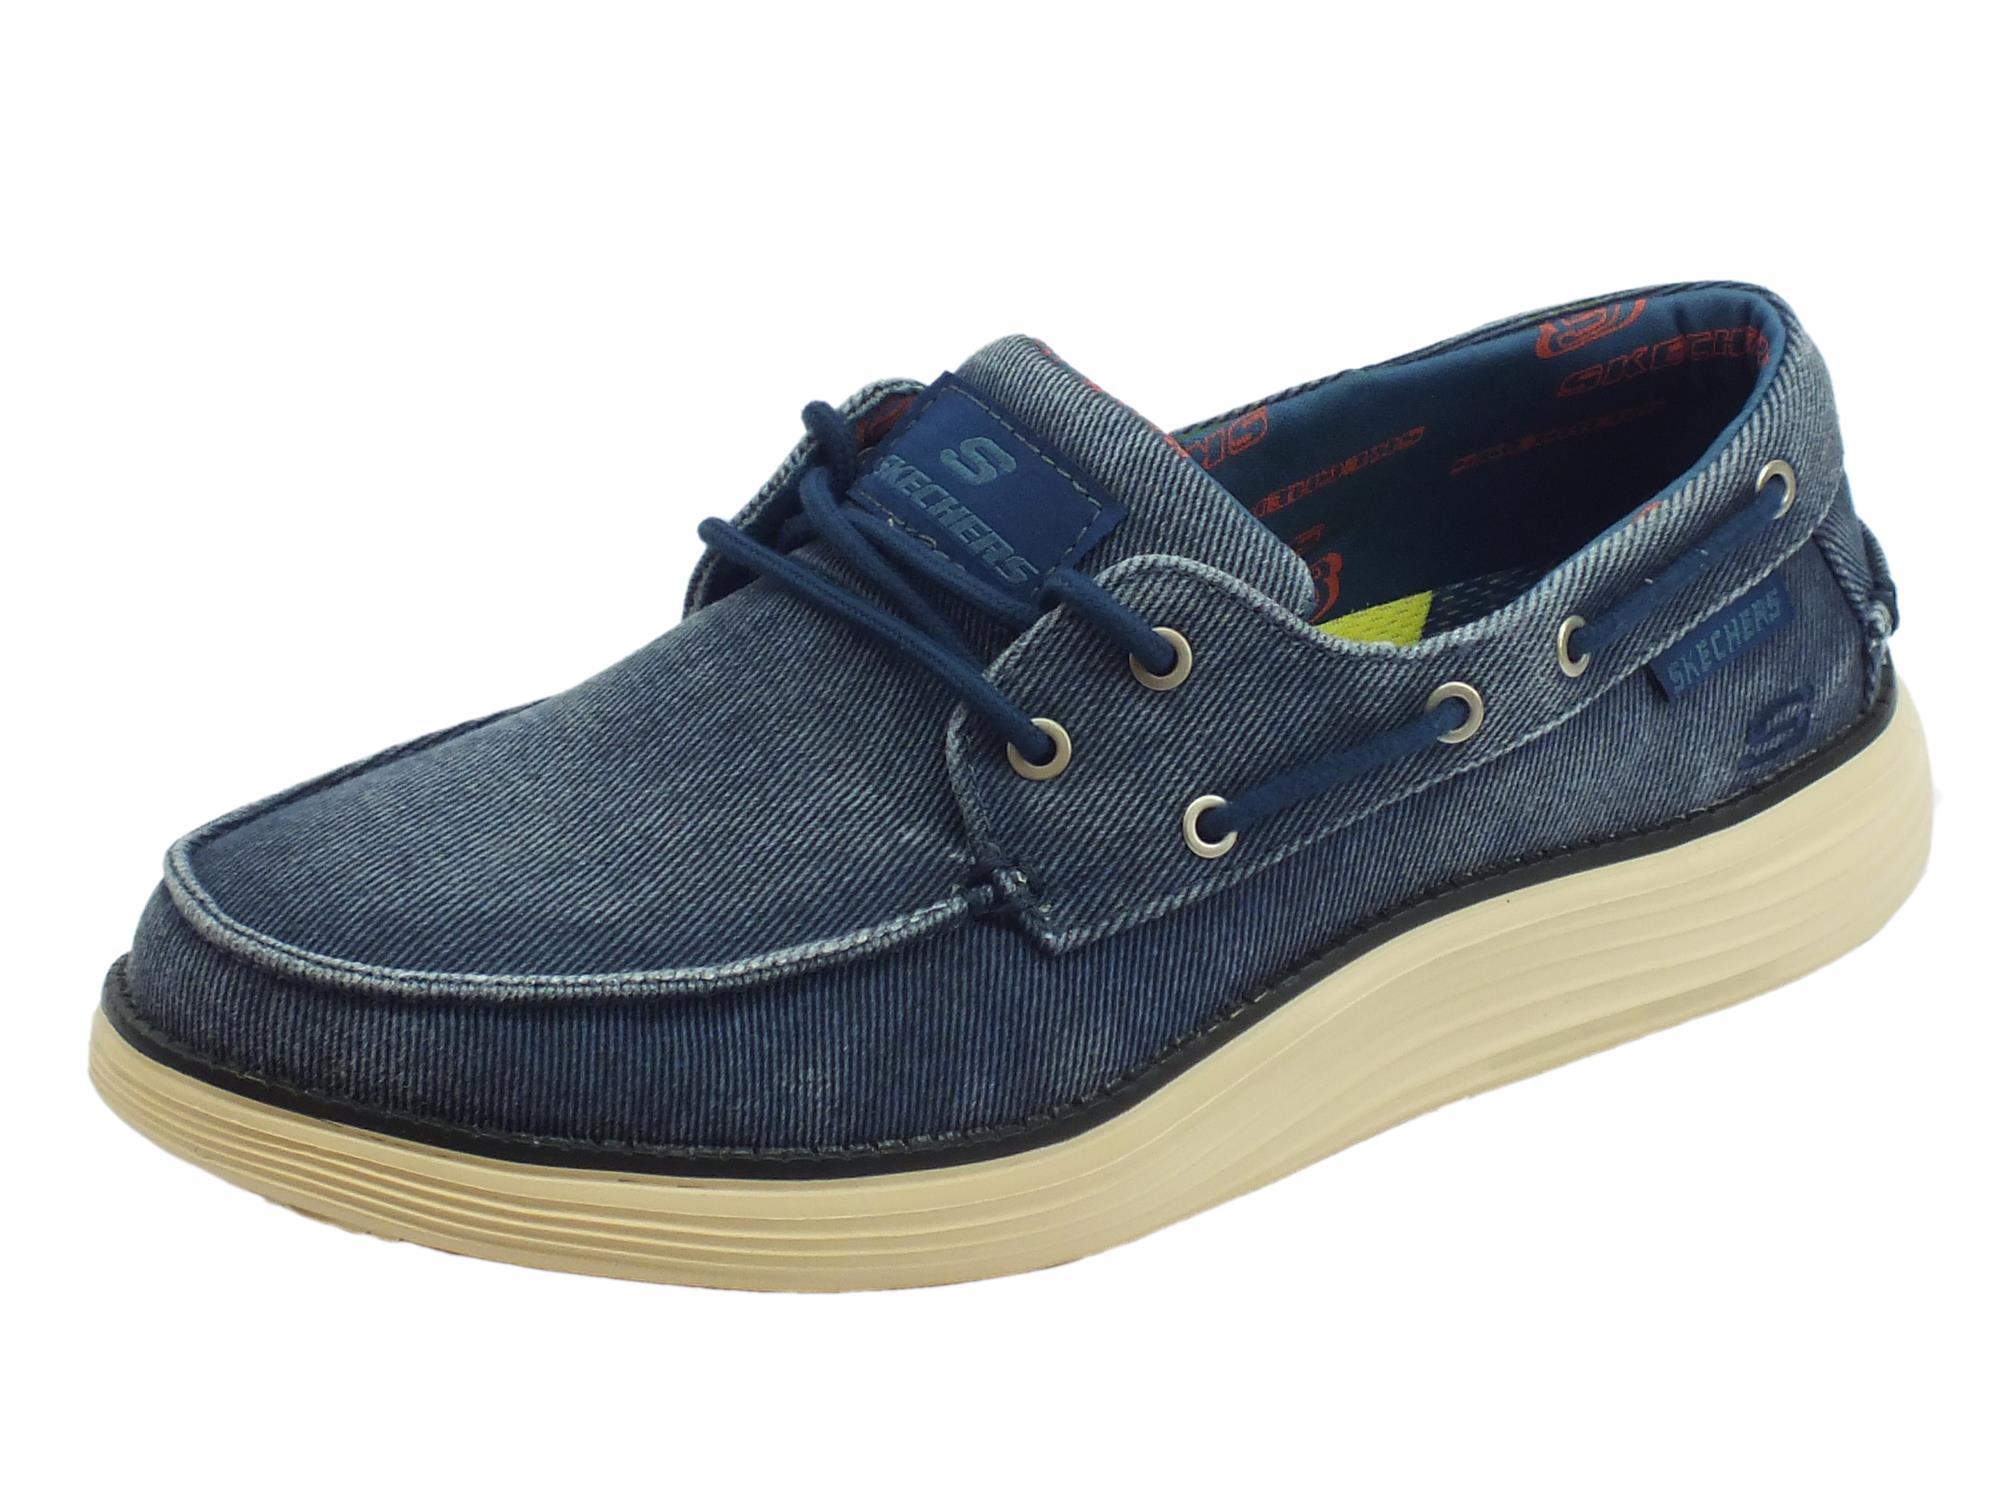 cfdd743e074f Skechers Classic FIT Status 2.0 Mosent scarpe uomo in tessuto blu